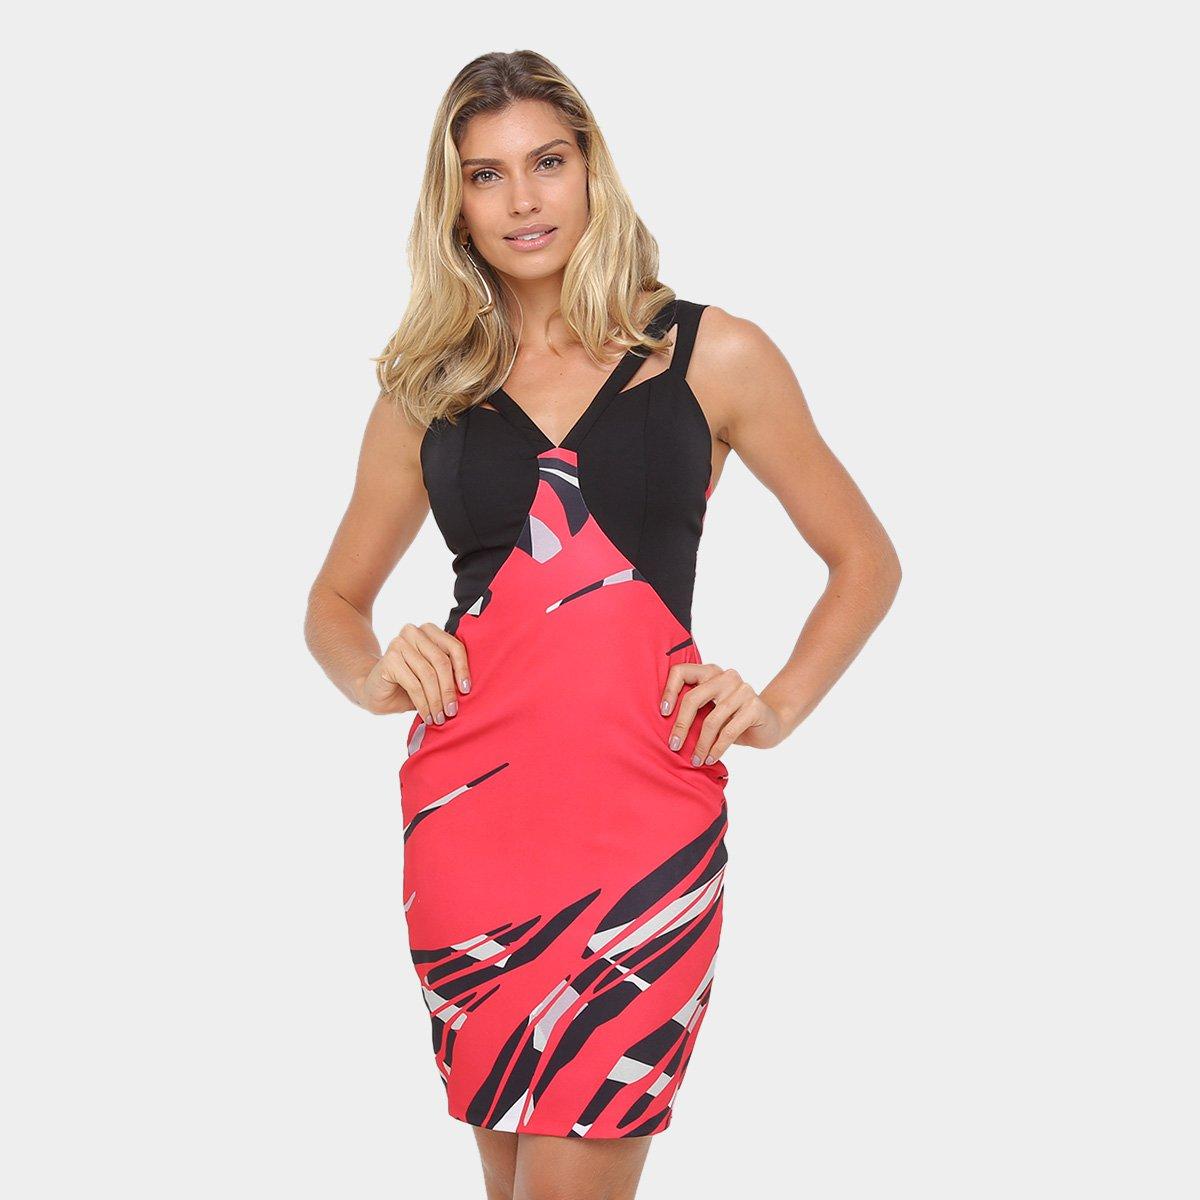 3e71c828b Vestido Morena Rosa Tubinho Midi Alça Estampado Recorte - Vermelho e Preto  | Zattini